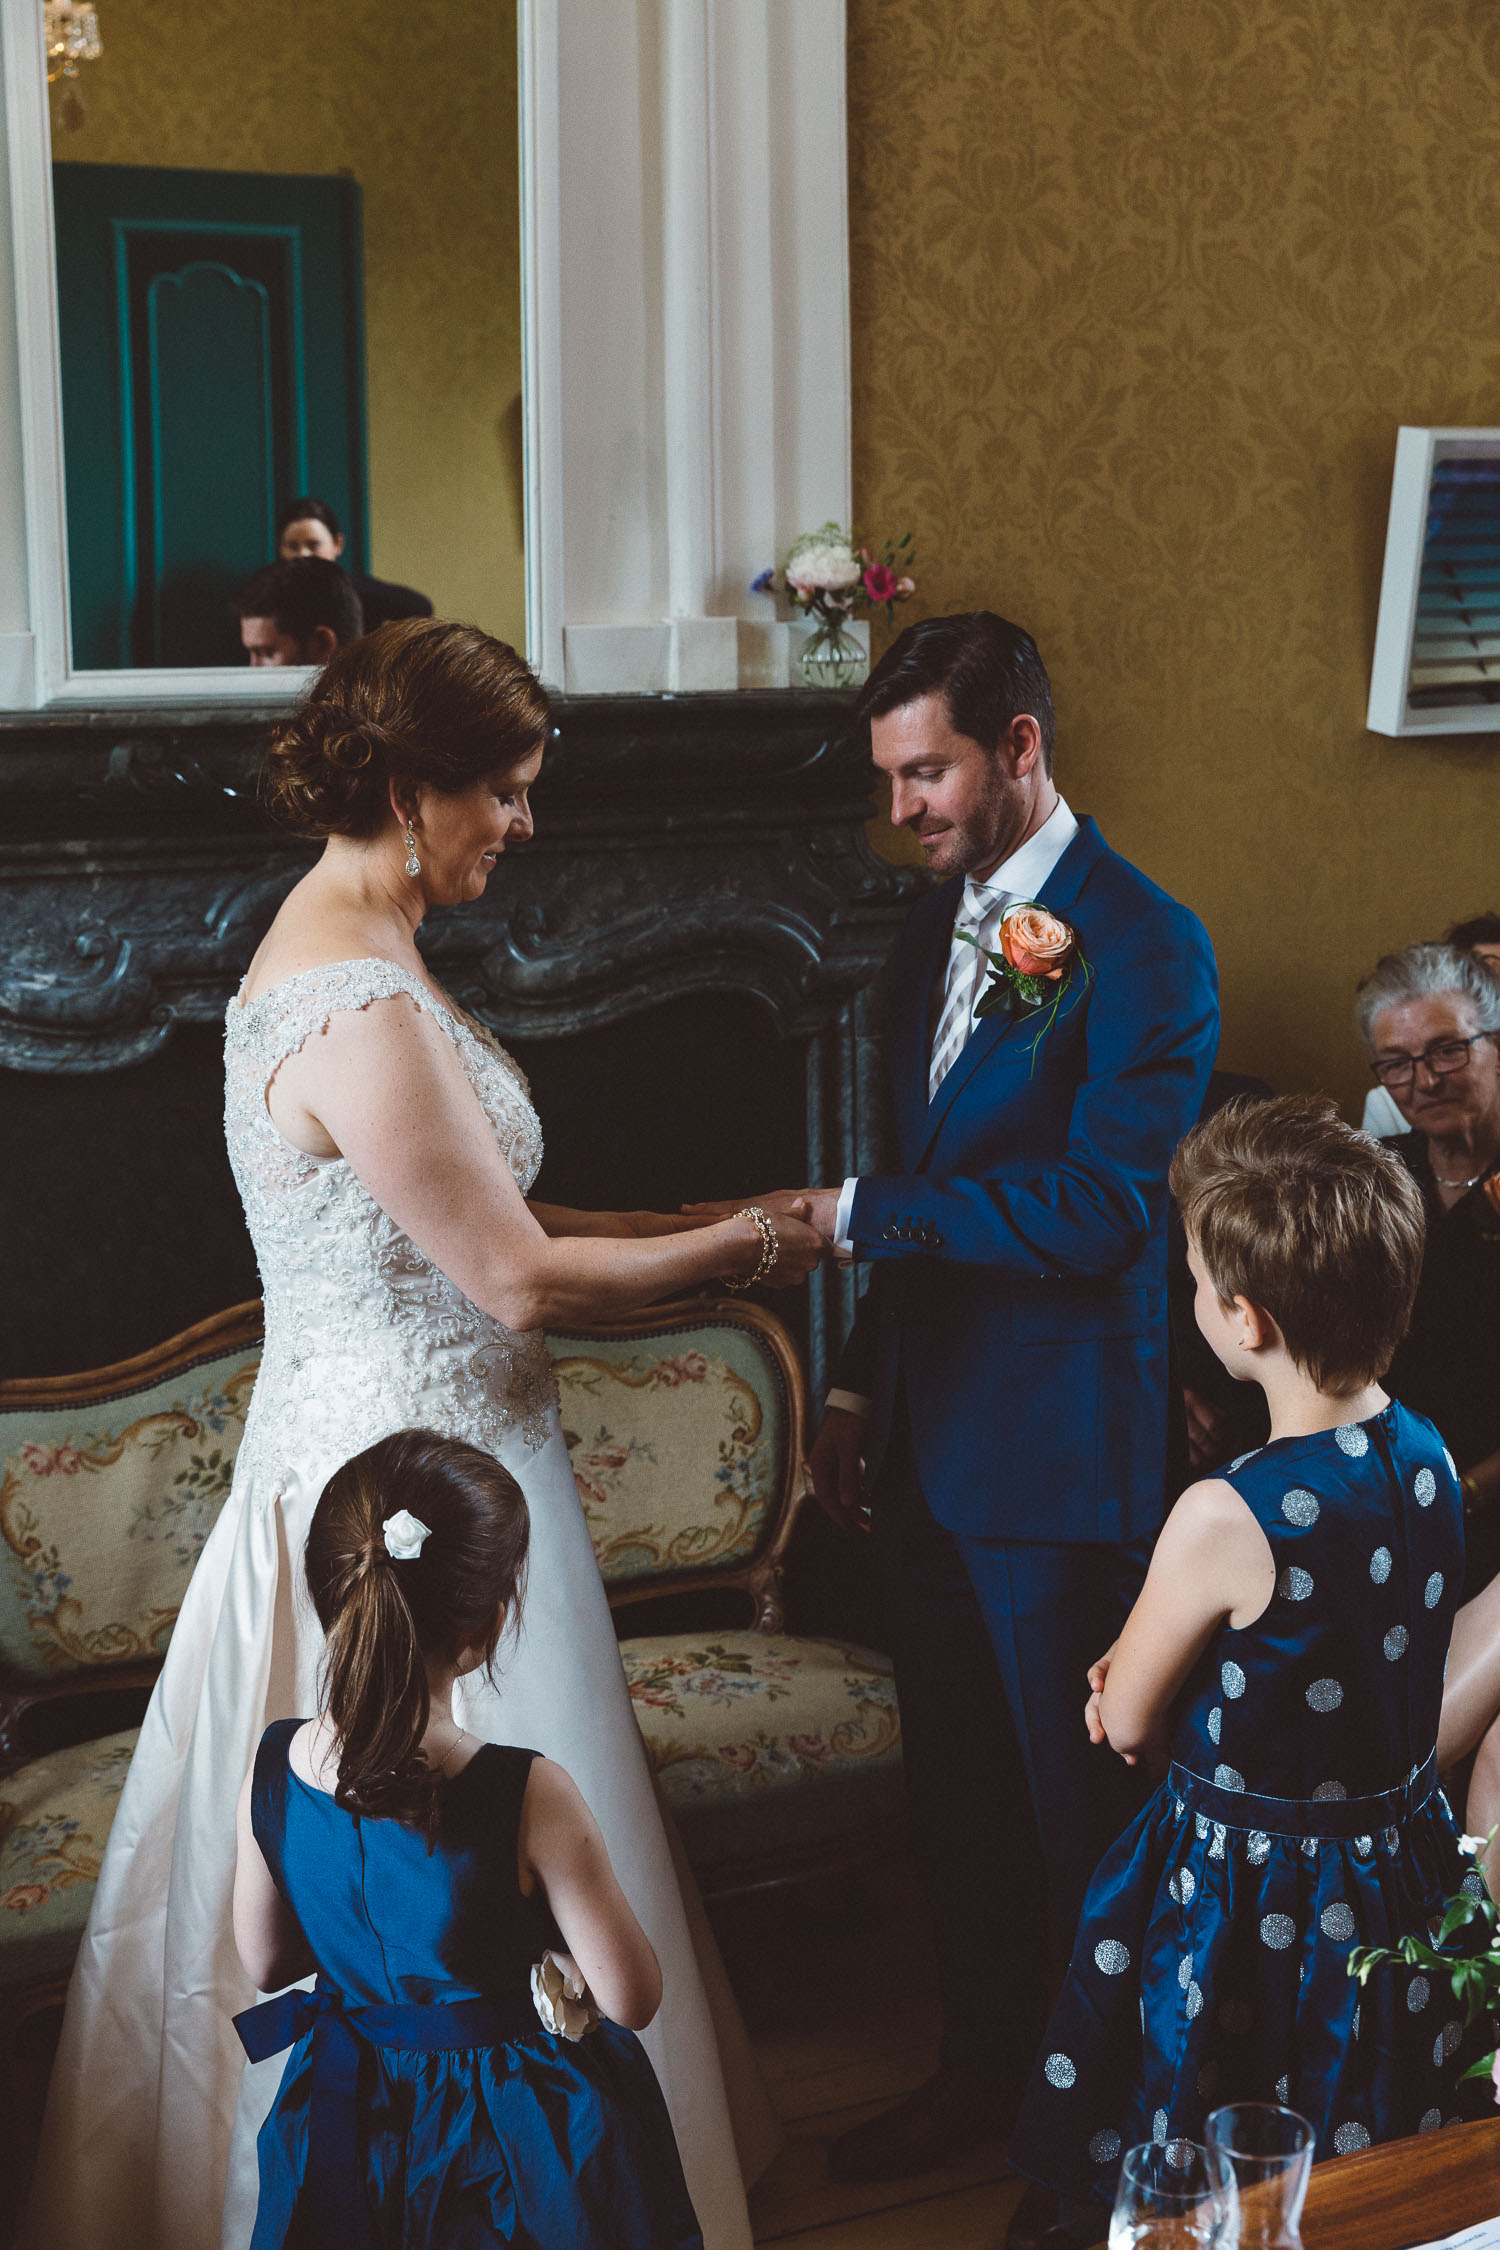 Wedding-huwelijk-trouwen-bruiloft-photography-fotografie-fotograaf-photographer-Huize-Frankendael-On-a-hazy-morning-Amsterdam-The-Netherlands-32.jpg